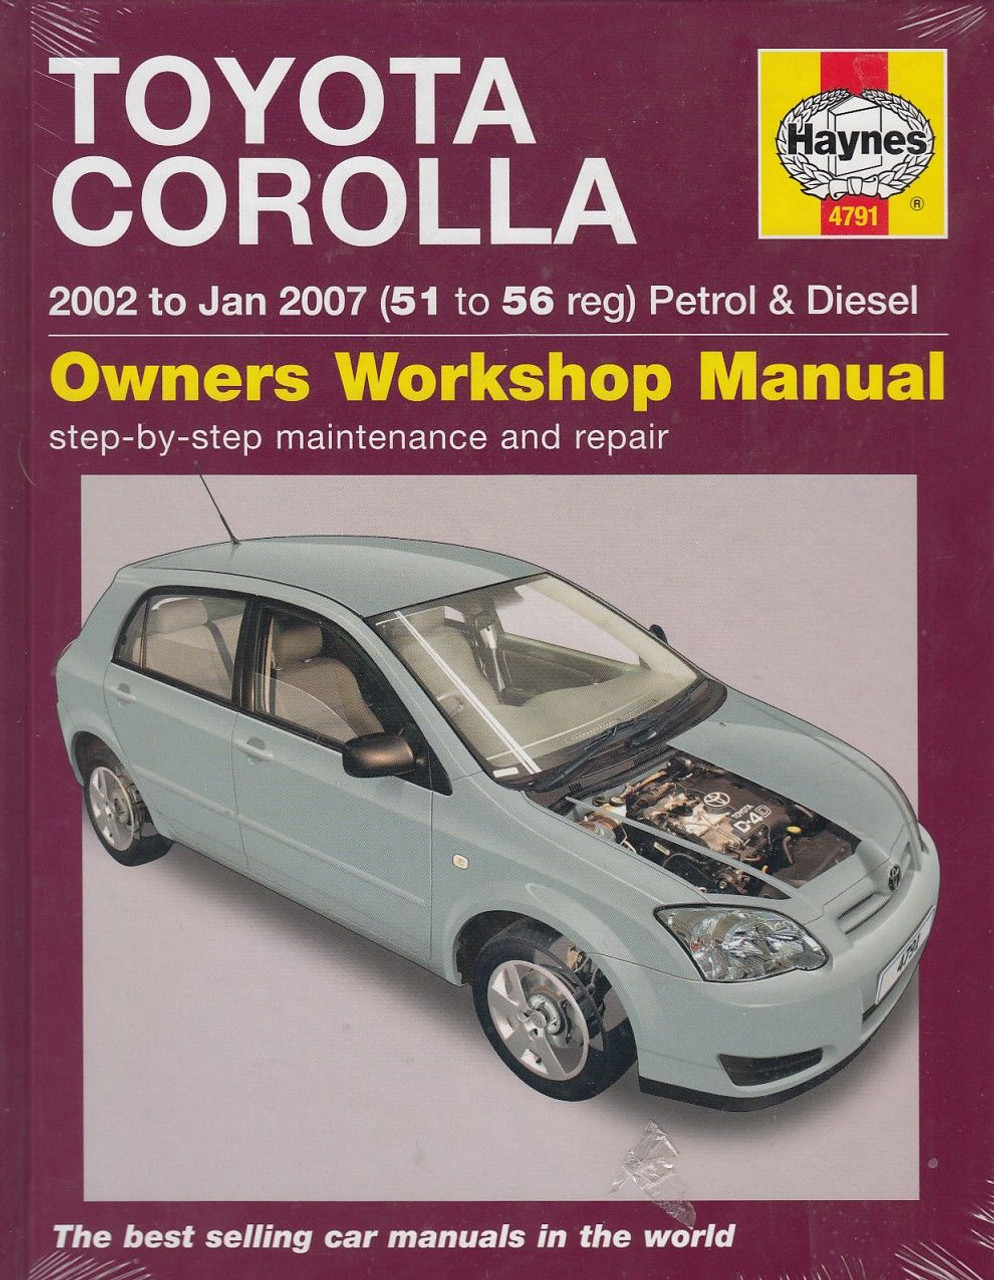 toyota corolla petrol 1 4 1 6 diesel 2 0 litre 2002 2008 rh automotobookshop com au Toyota Yaris IA Manual Transmission Toyota Yaris Manual